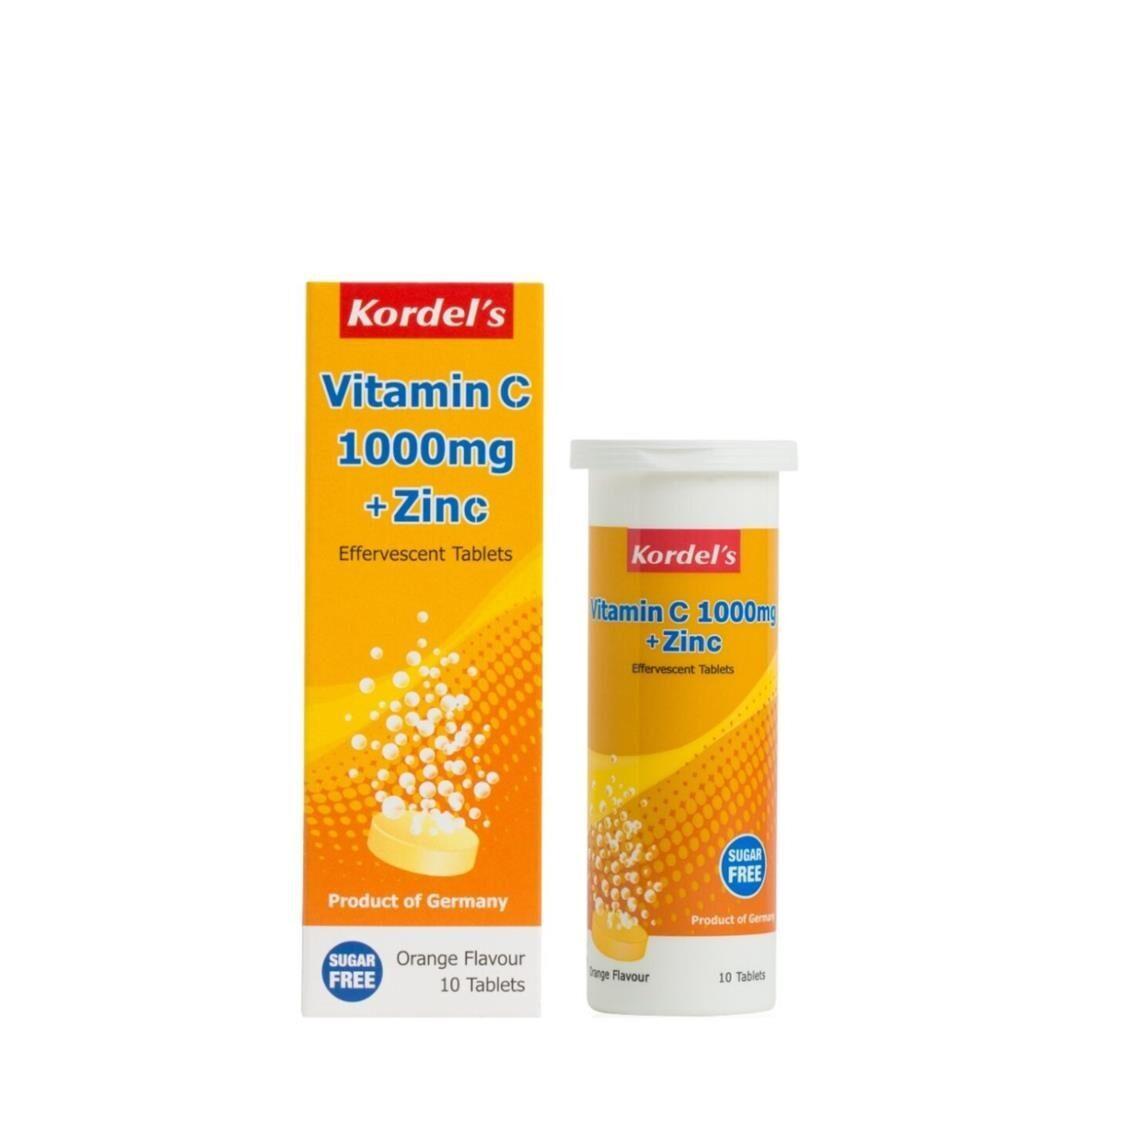 Kordels Effervescent Vitamin C 1000mg  Zinc Orange 10s